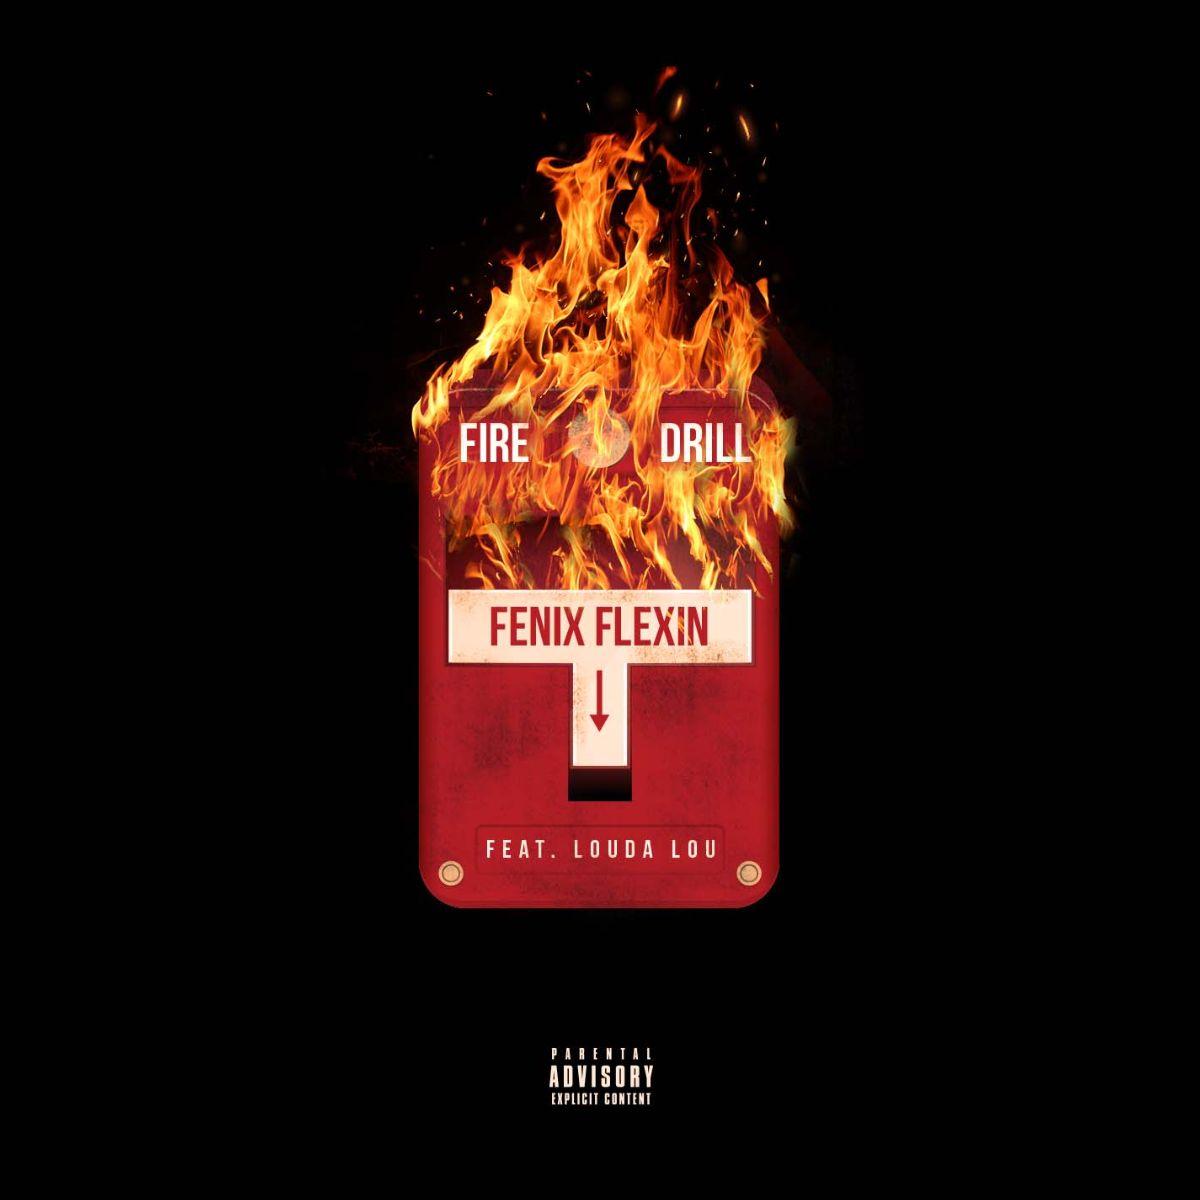 "FENIX FLEXIN SHARES NEW SINGLE ""FIRE DRILL"" FEATURING LOUDA LOU"